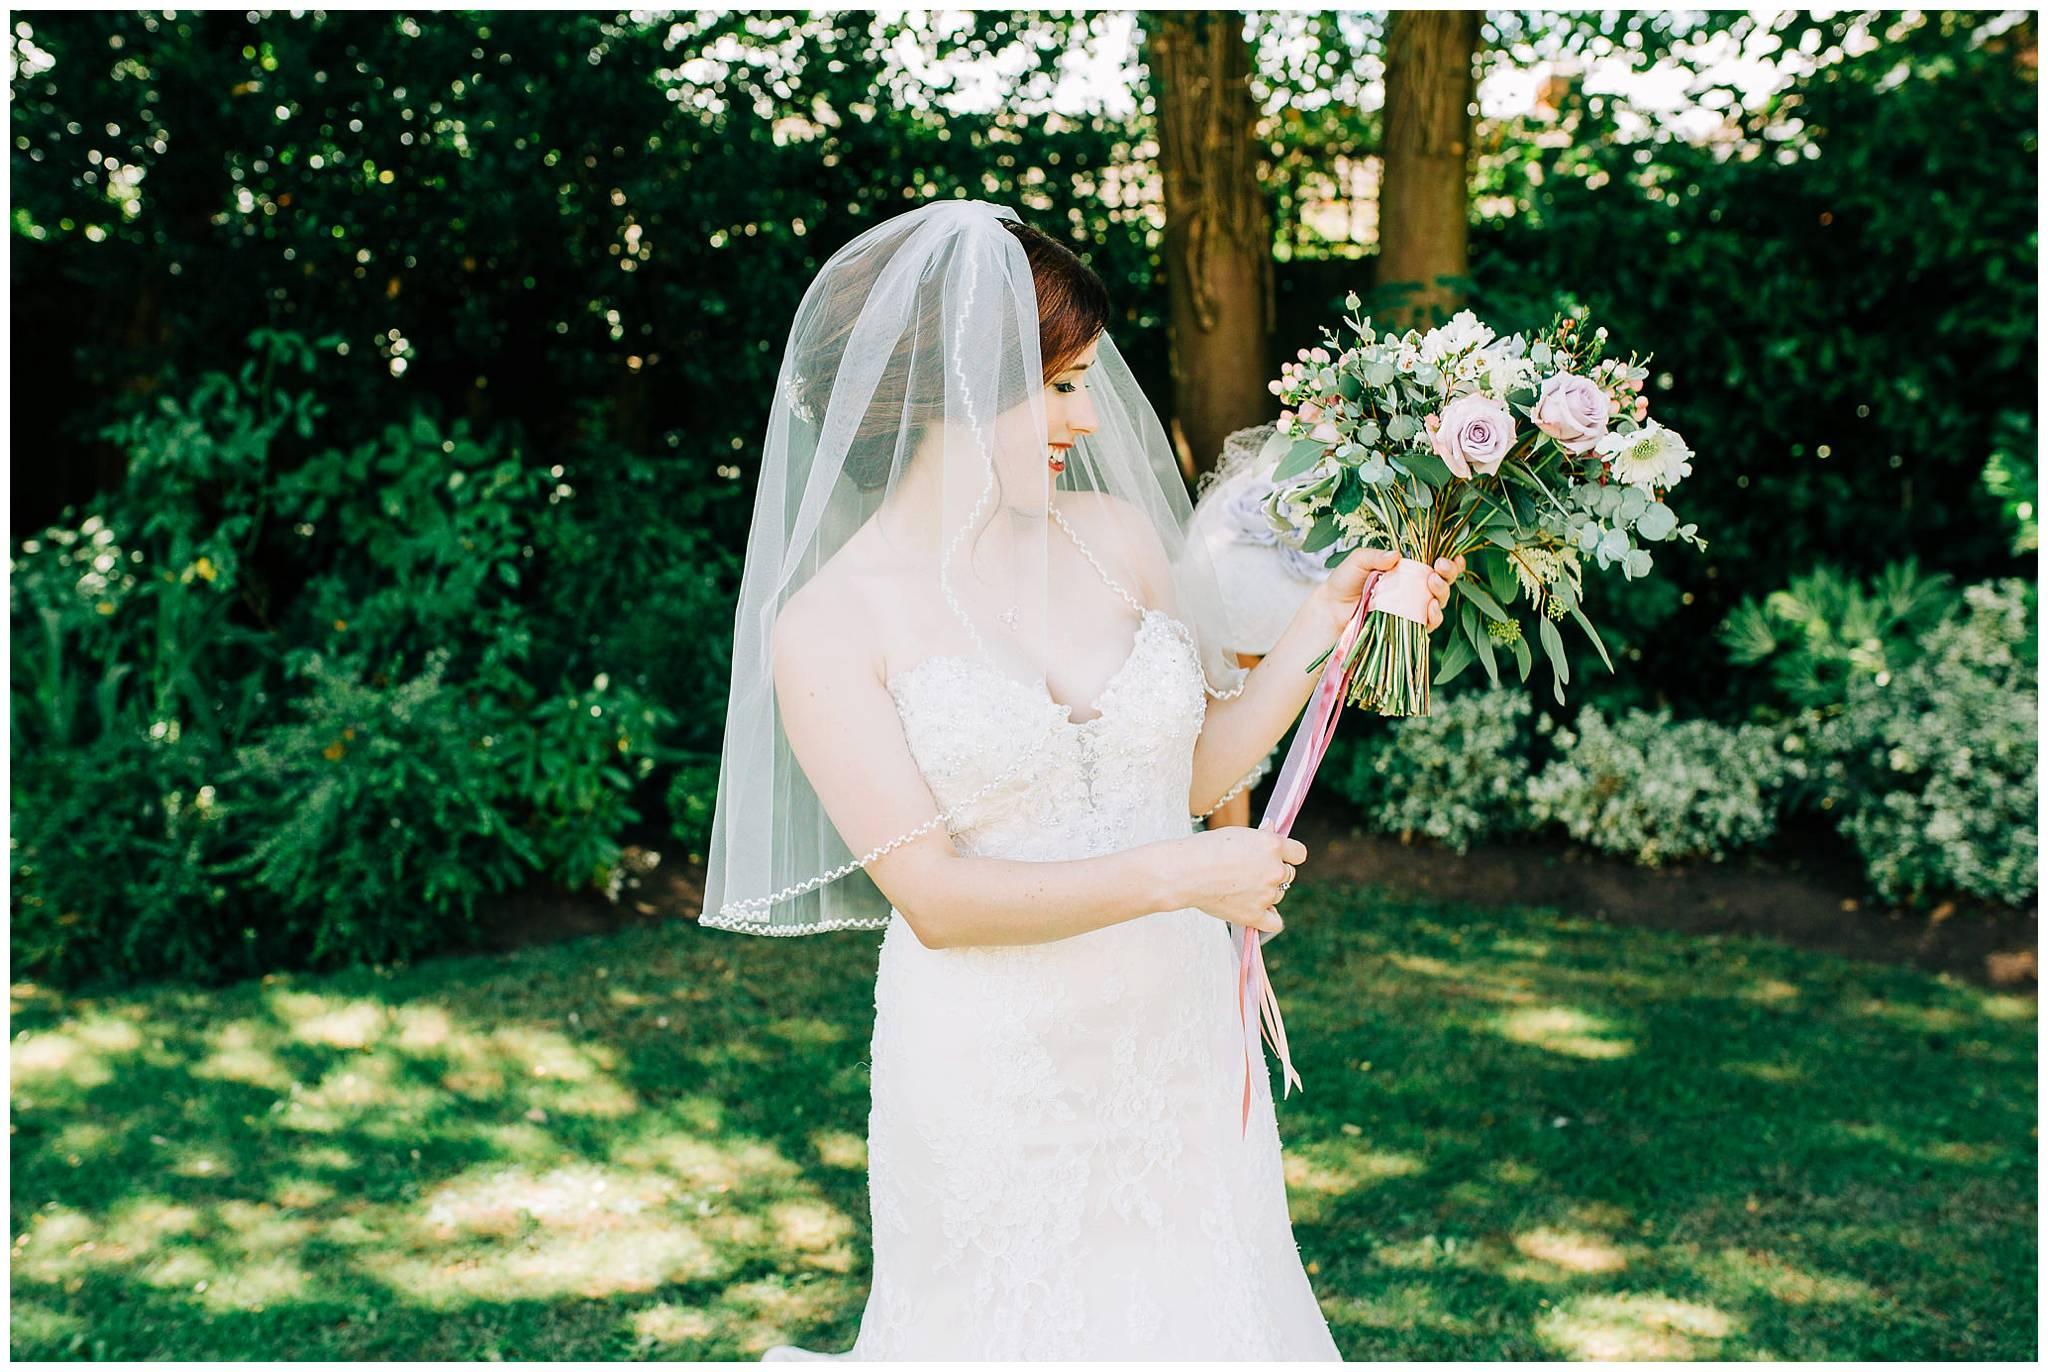 Summer Garden Wedding - The Old Vicarage Boutique Hotel56.jpg